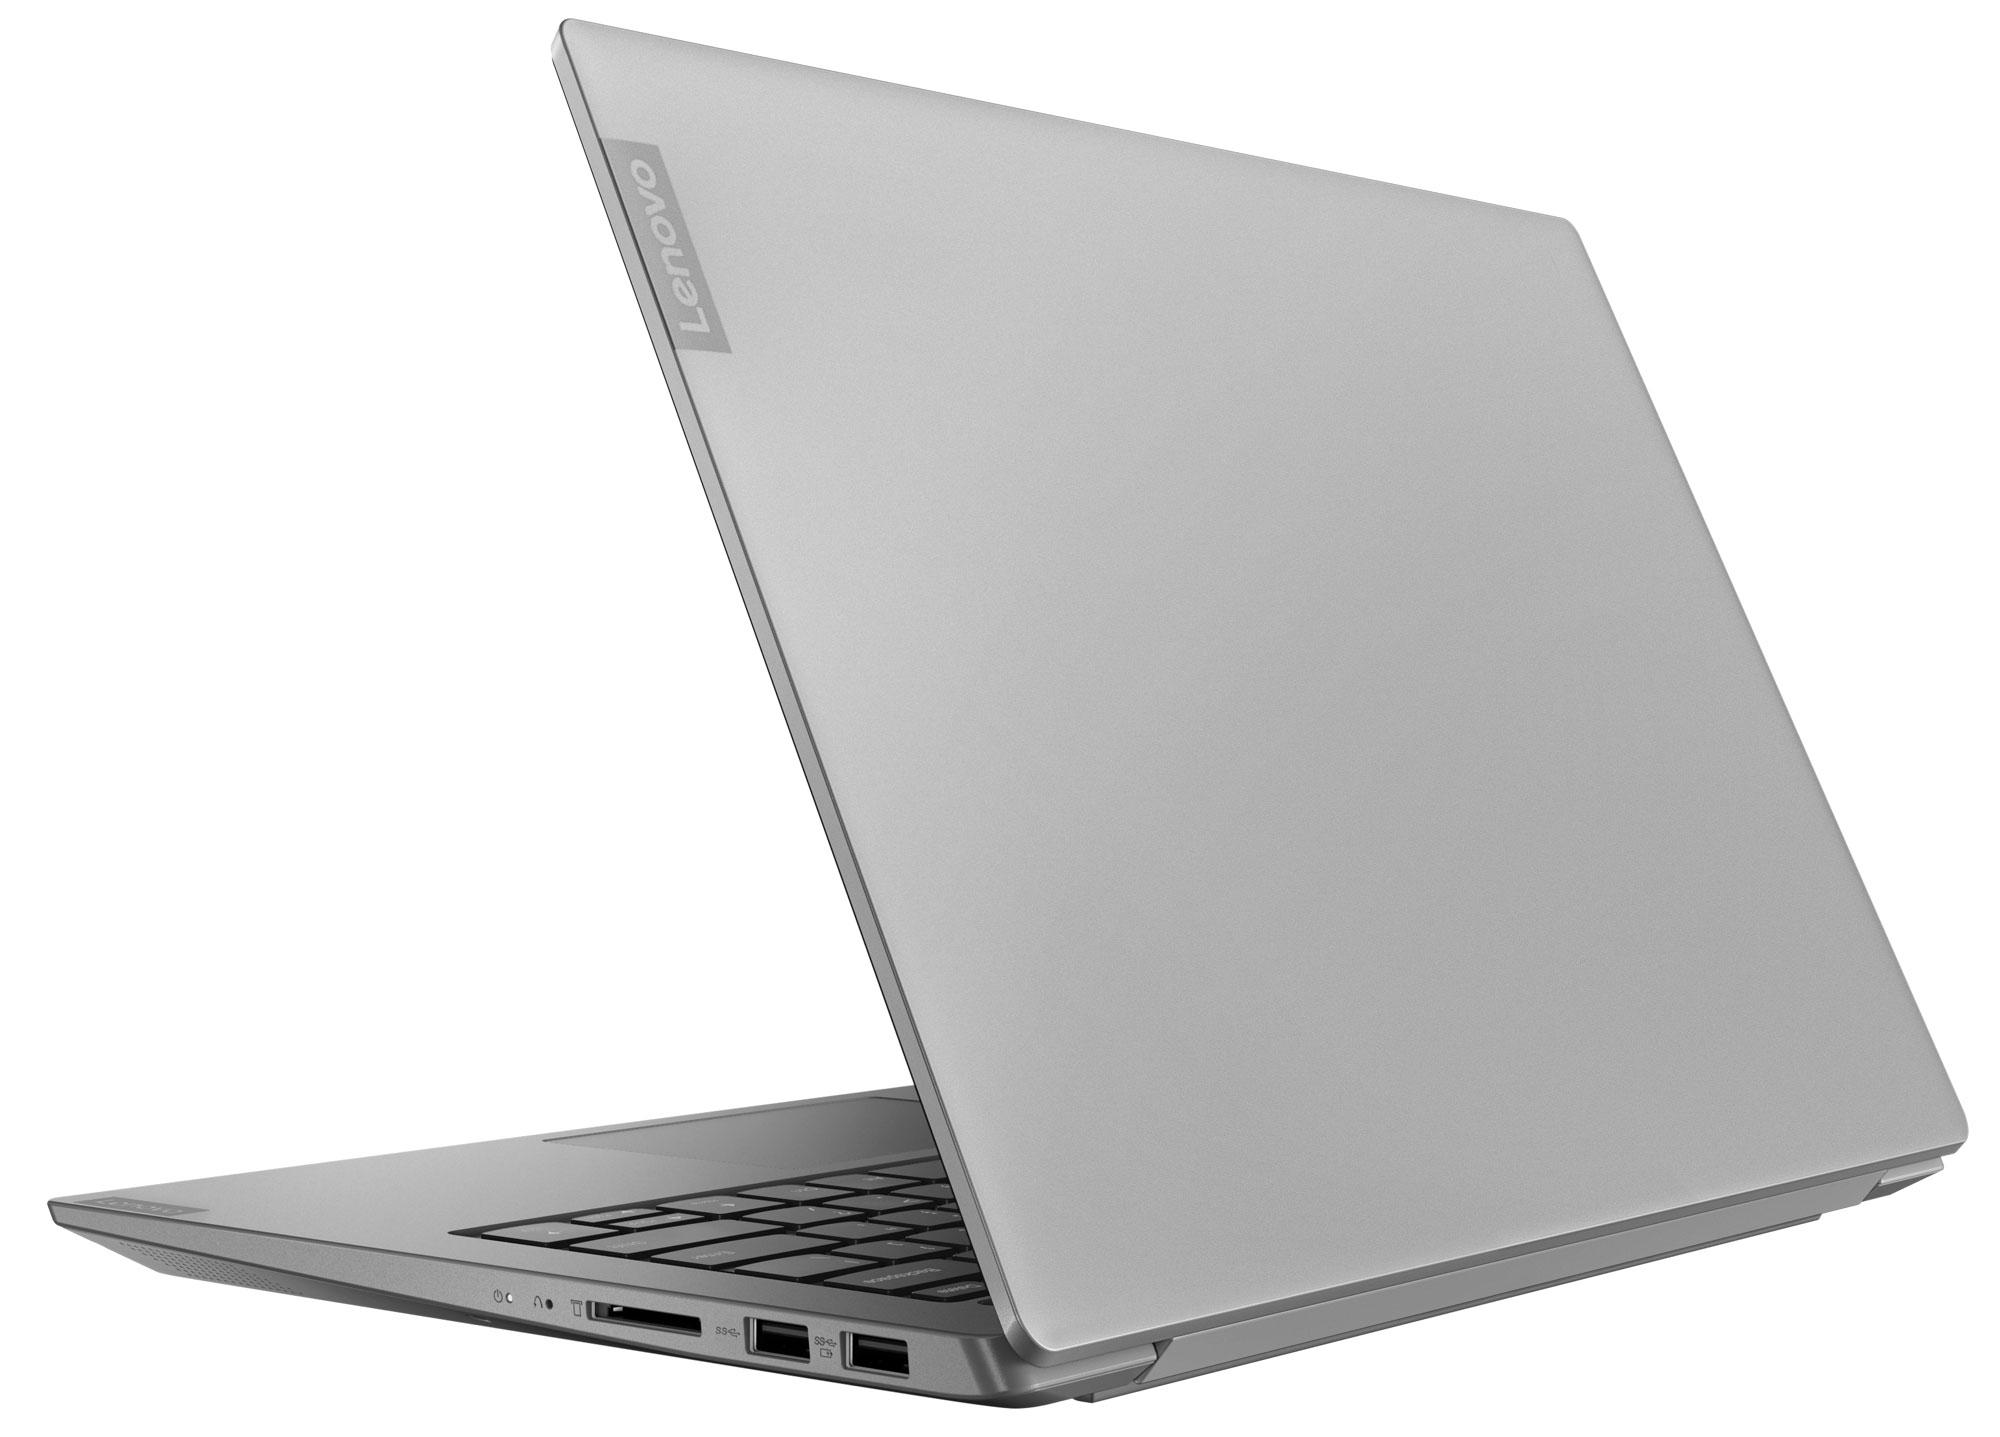 Фото  Ноутбук Lenovo ideapad S340-14IWL Platinum Grey (81N700B3RE)